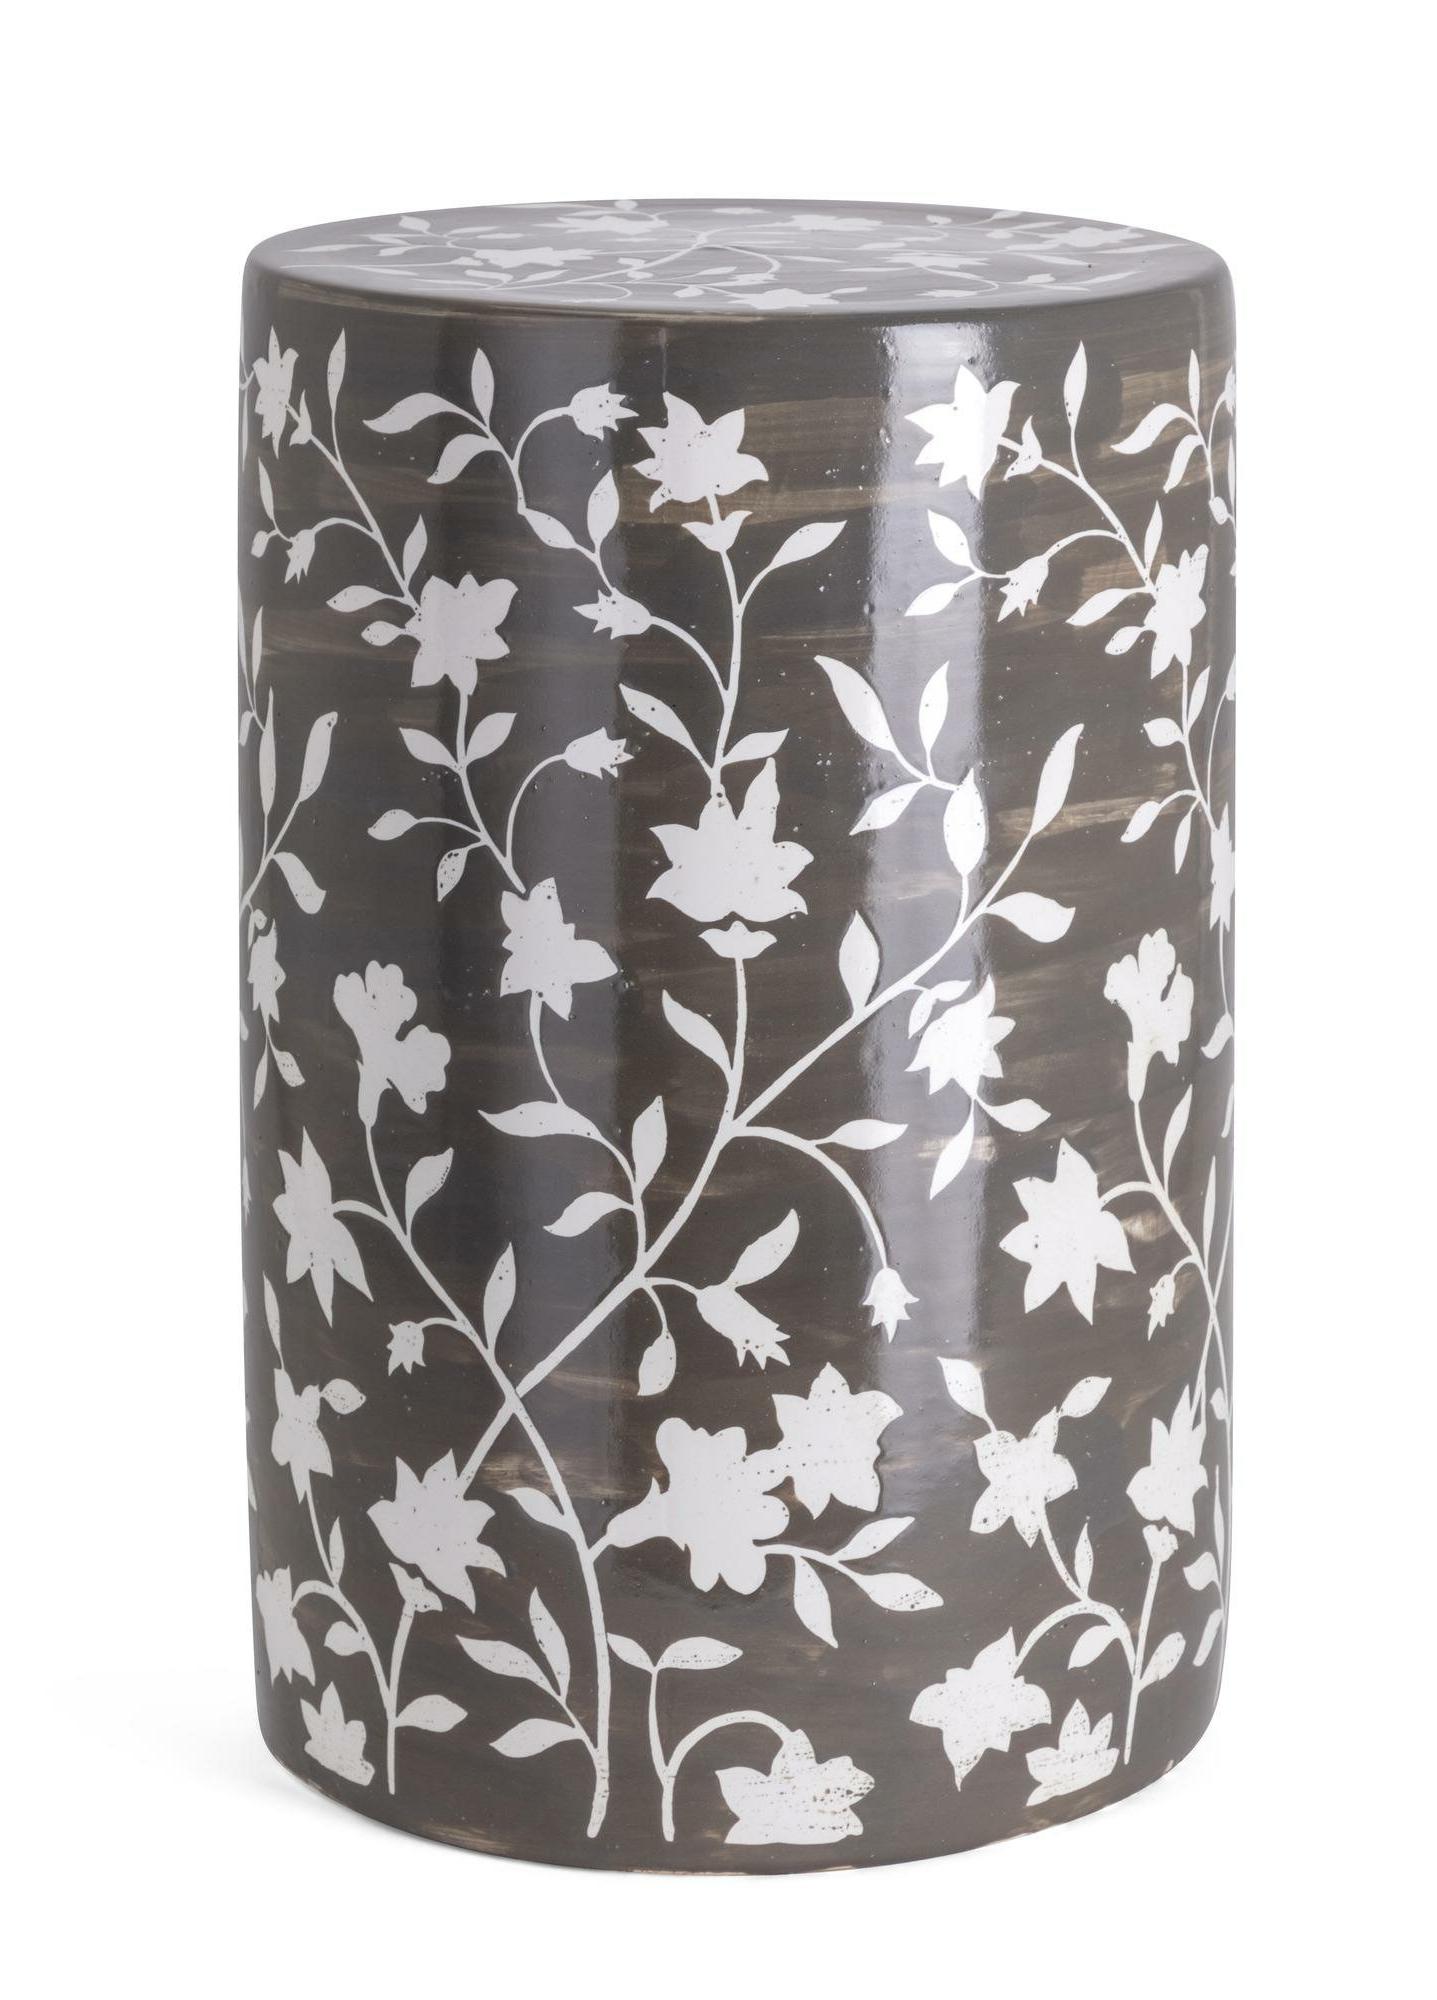 Kuhnhenn Handpainted Garden Stool With Regard To Trendy Murphy Ceramic Garden Stools (View 9 of 30)